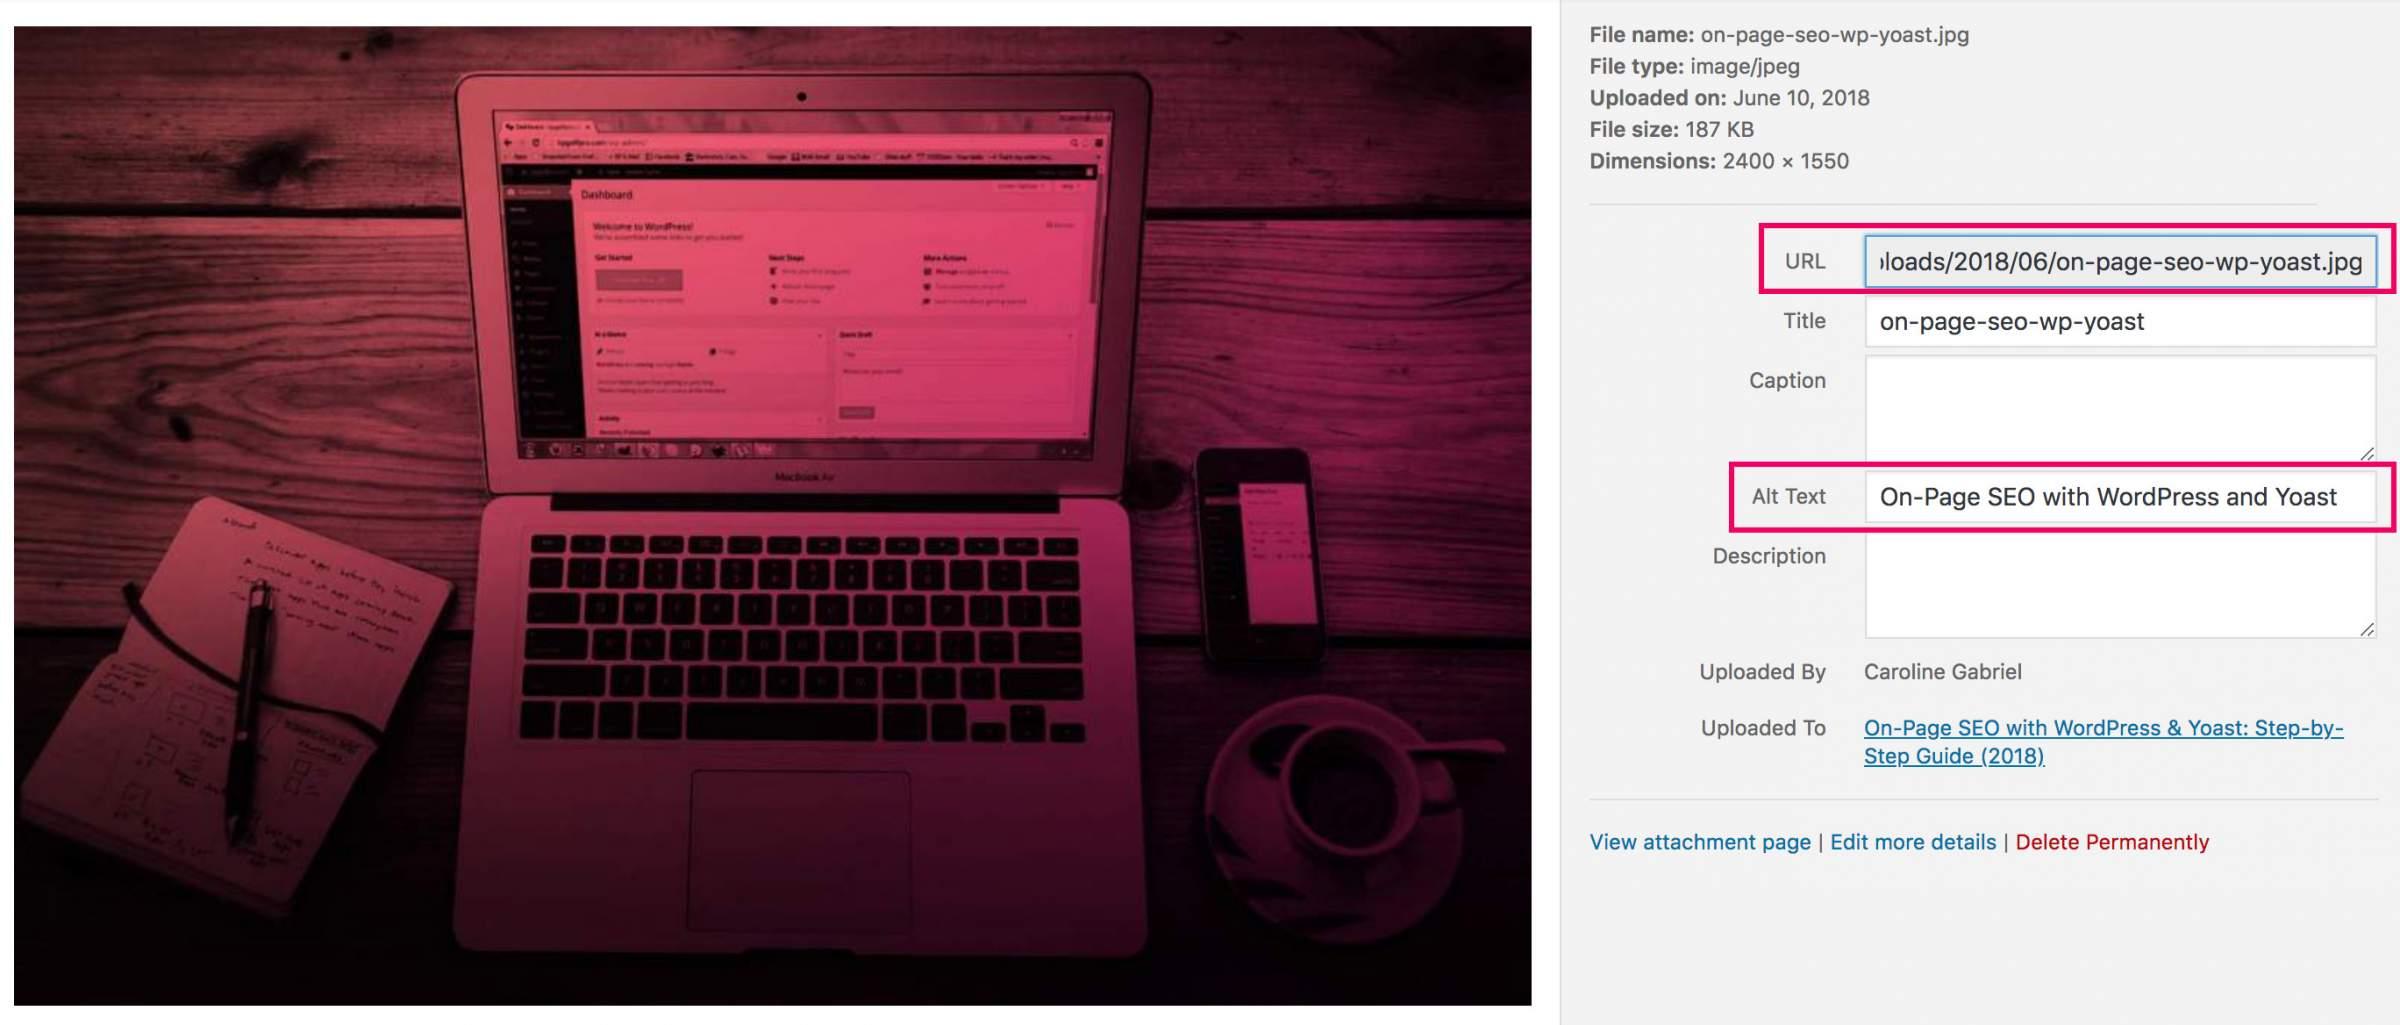 On-Page SEO WordPress Images Optimization